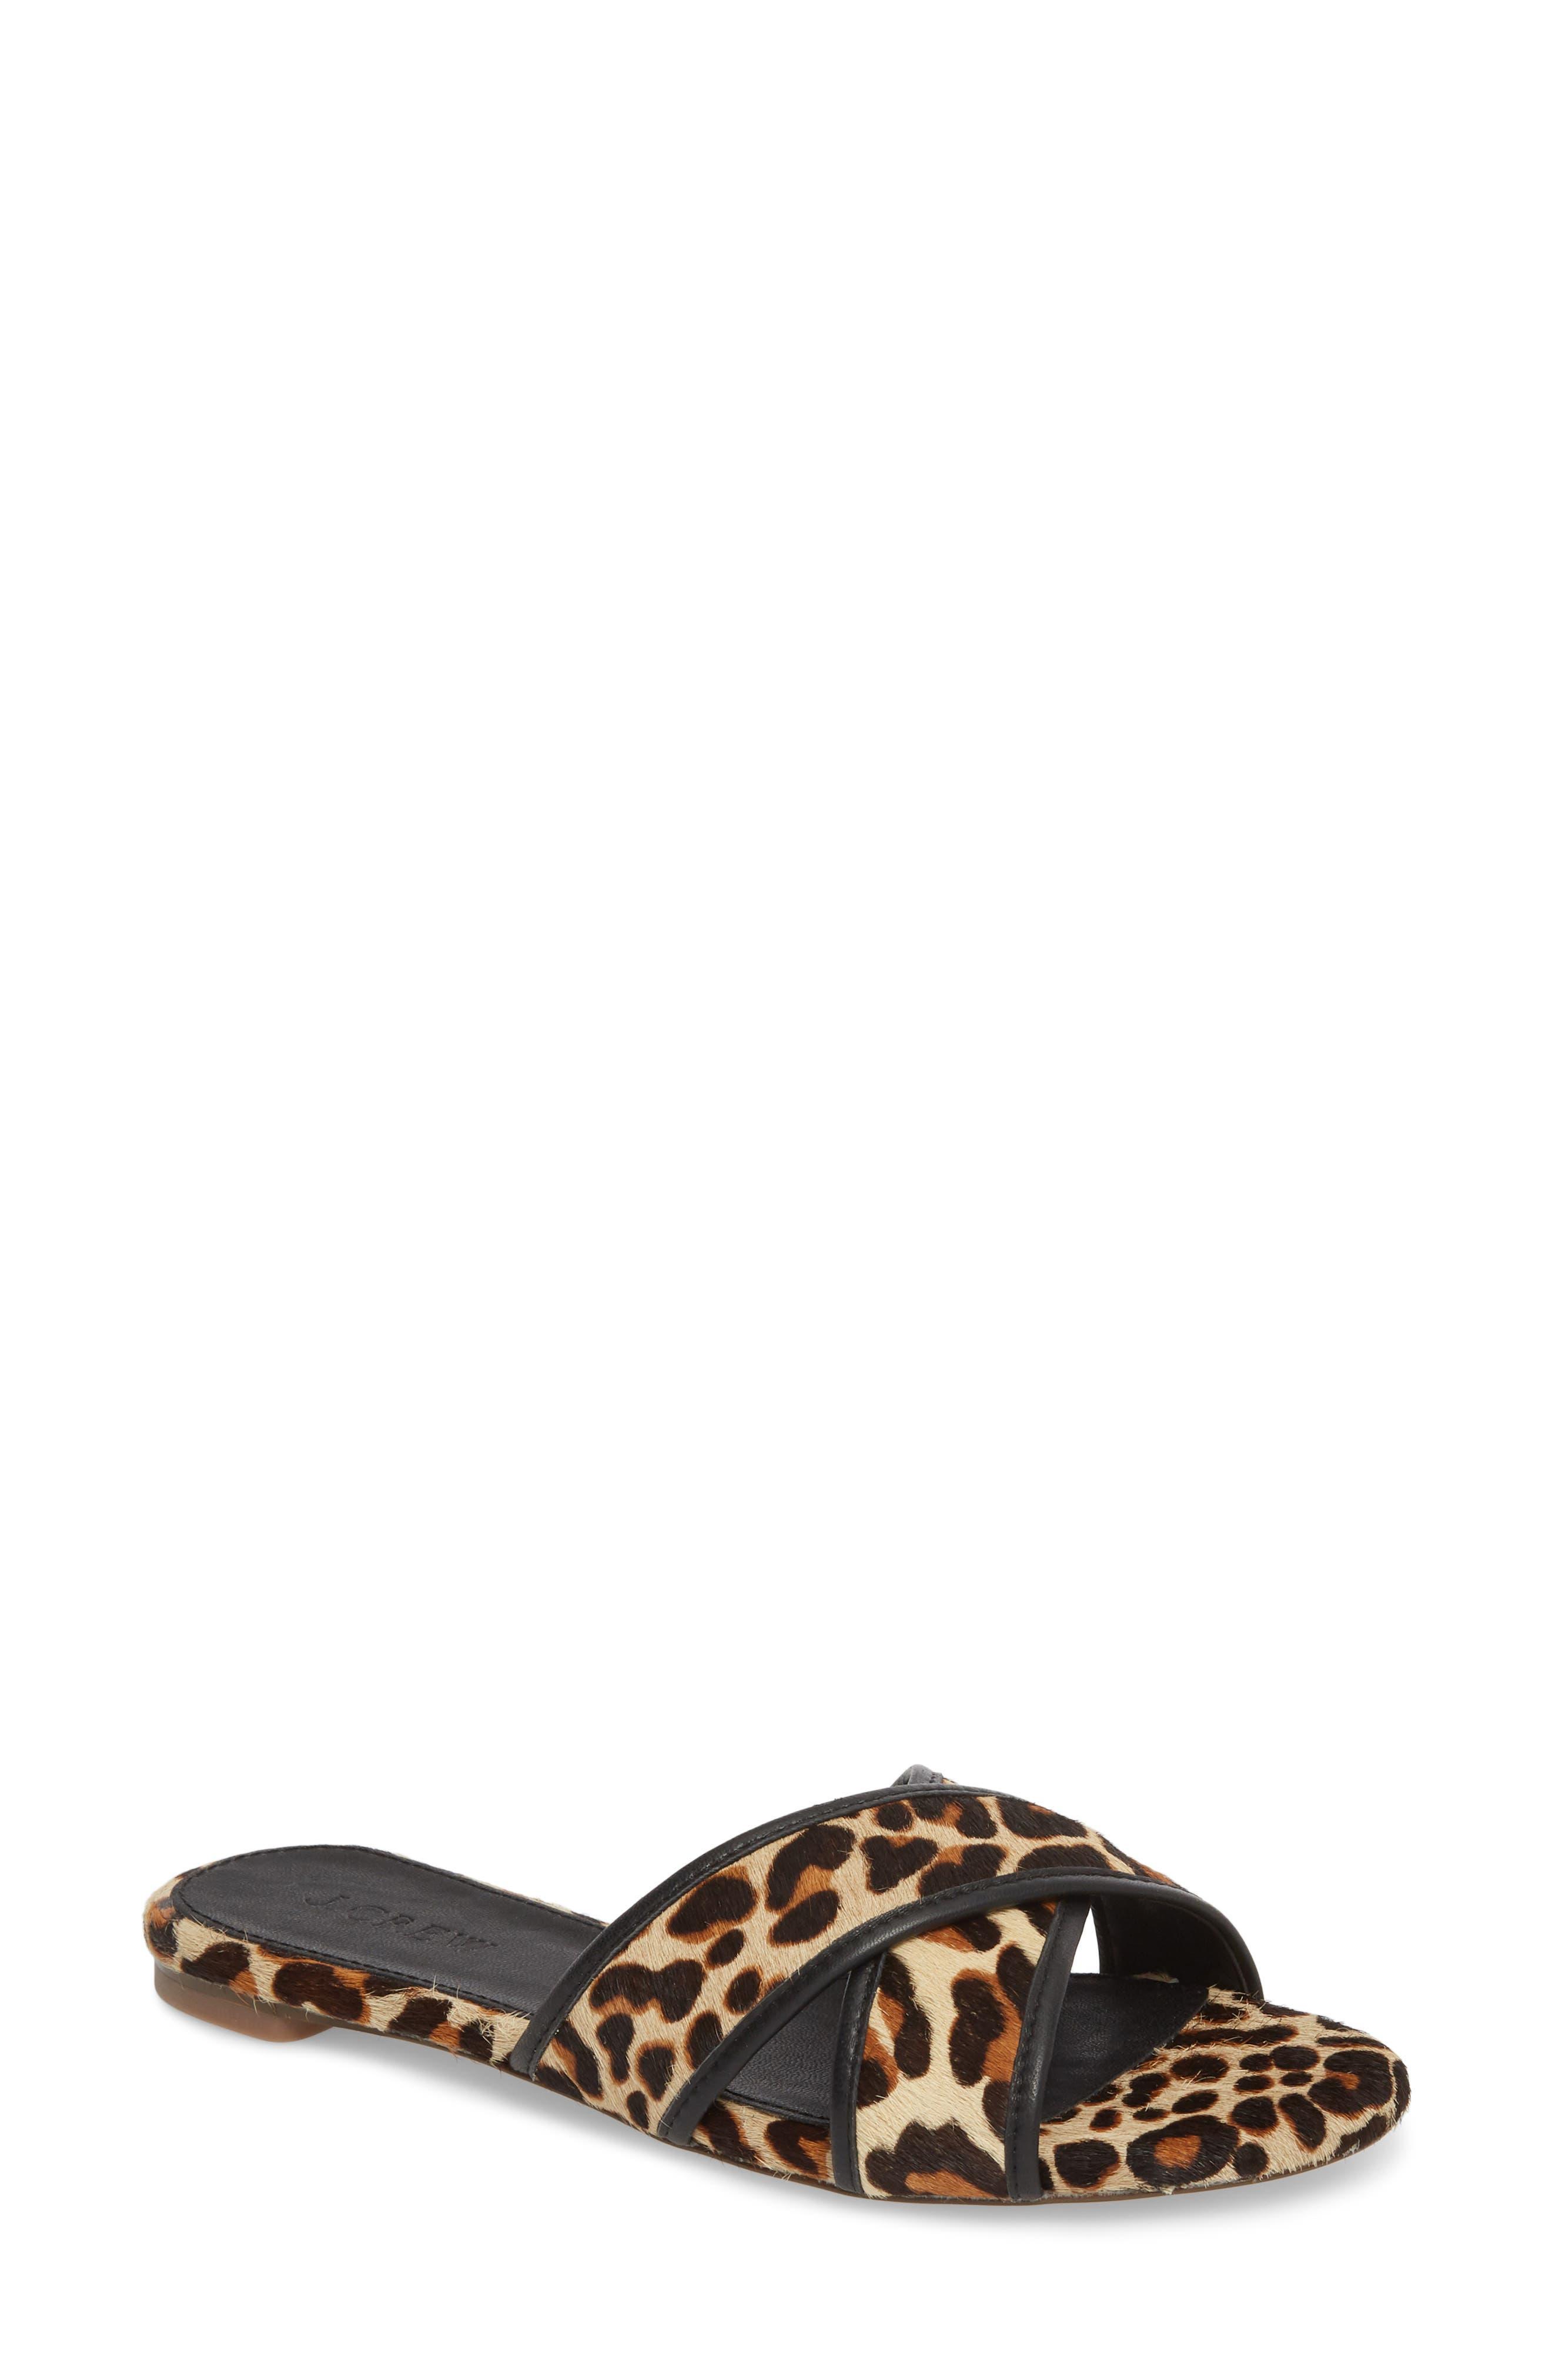 Cora Genuine Calf Hair Slide Sandal,                             Main thumbnail 1, color,                             Chocolate Sepia